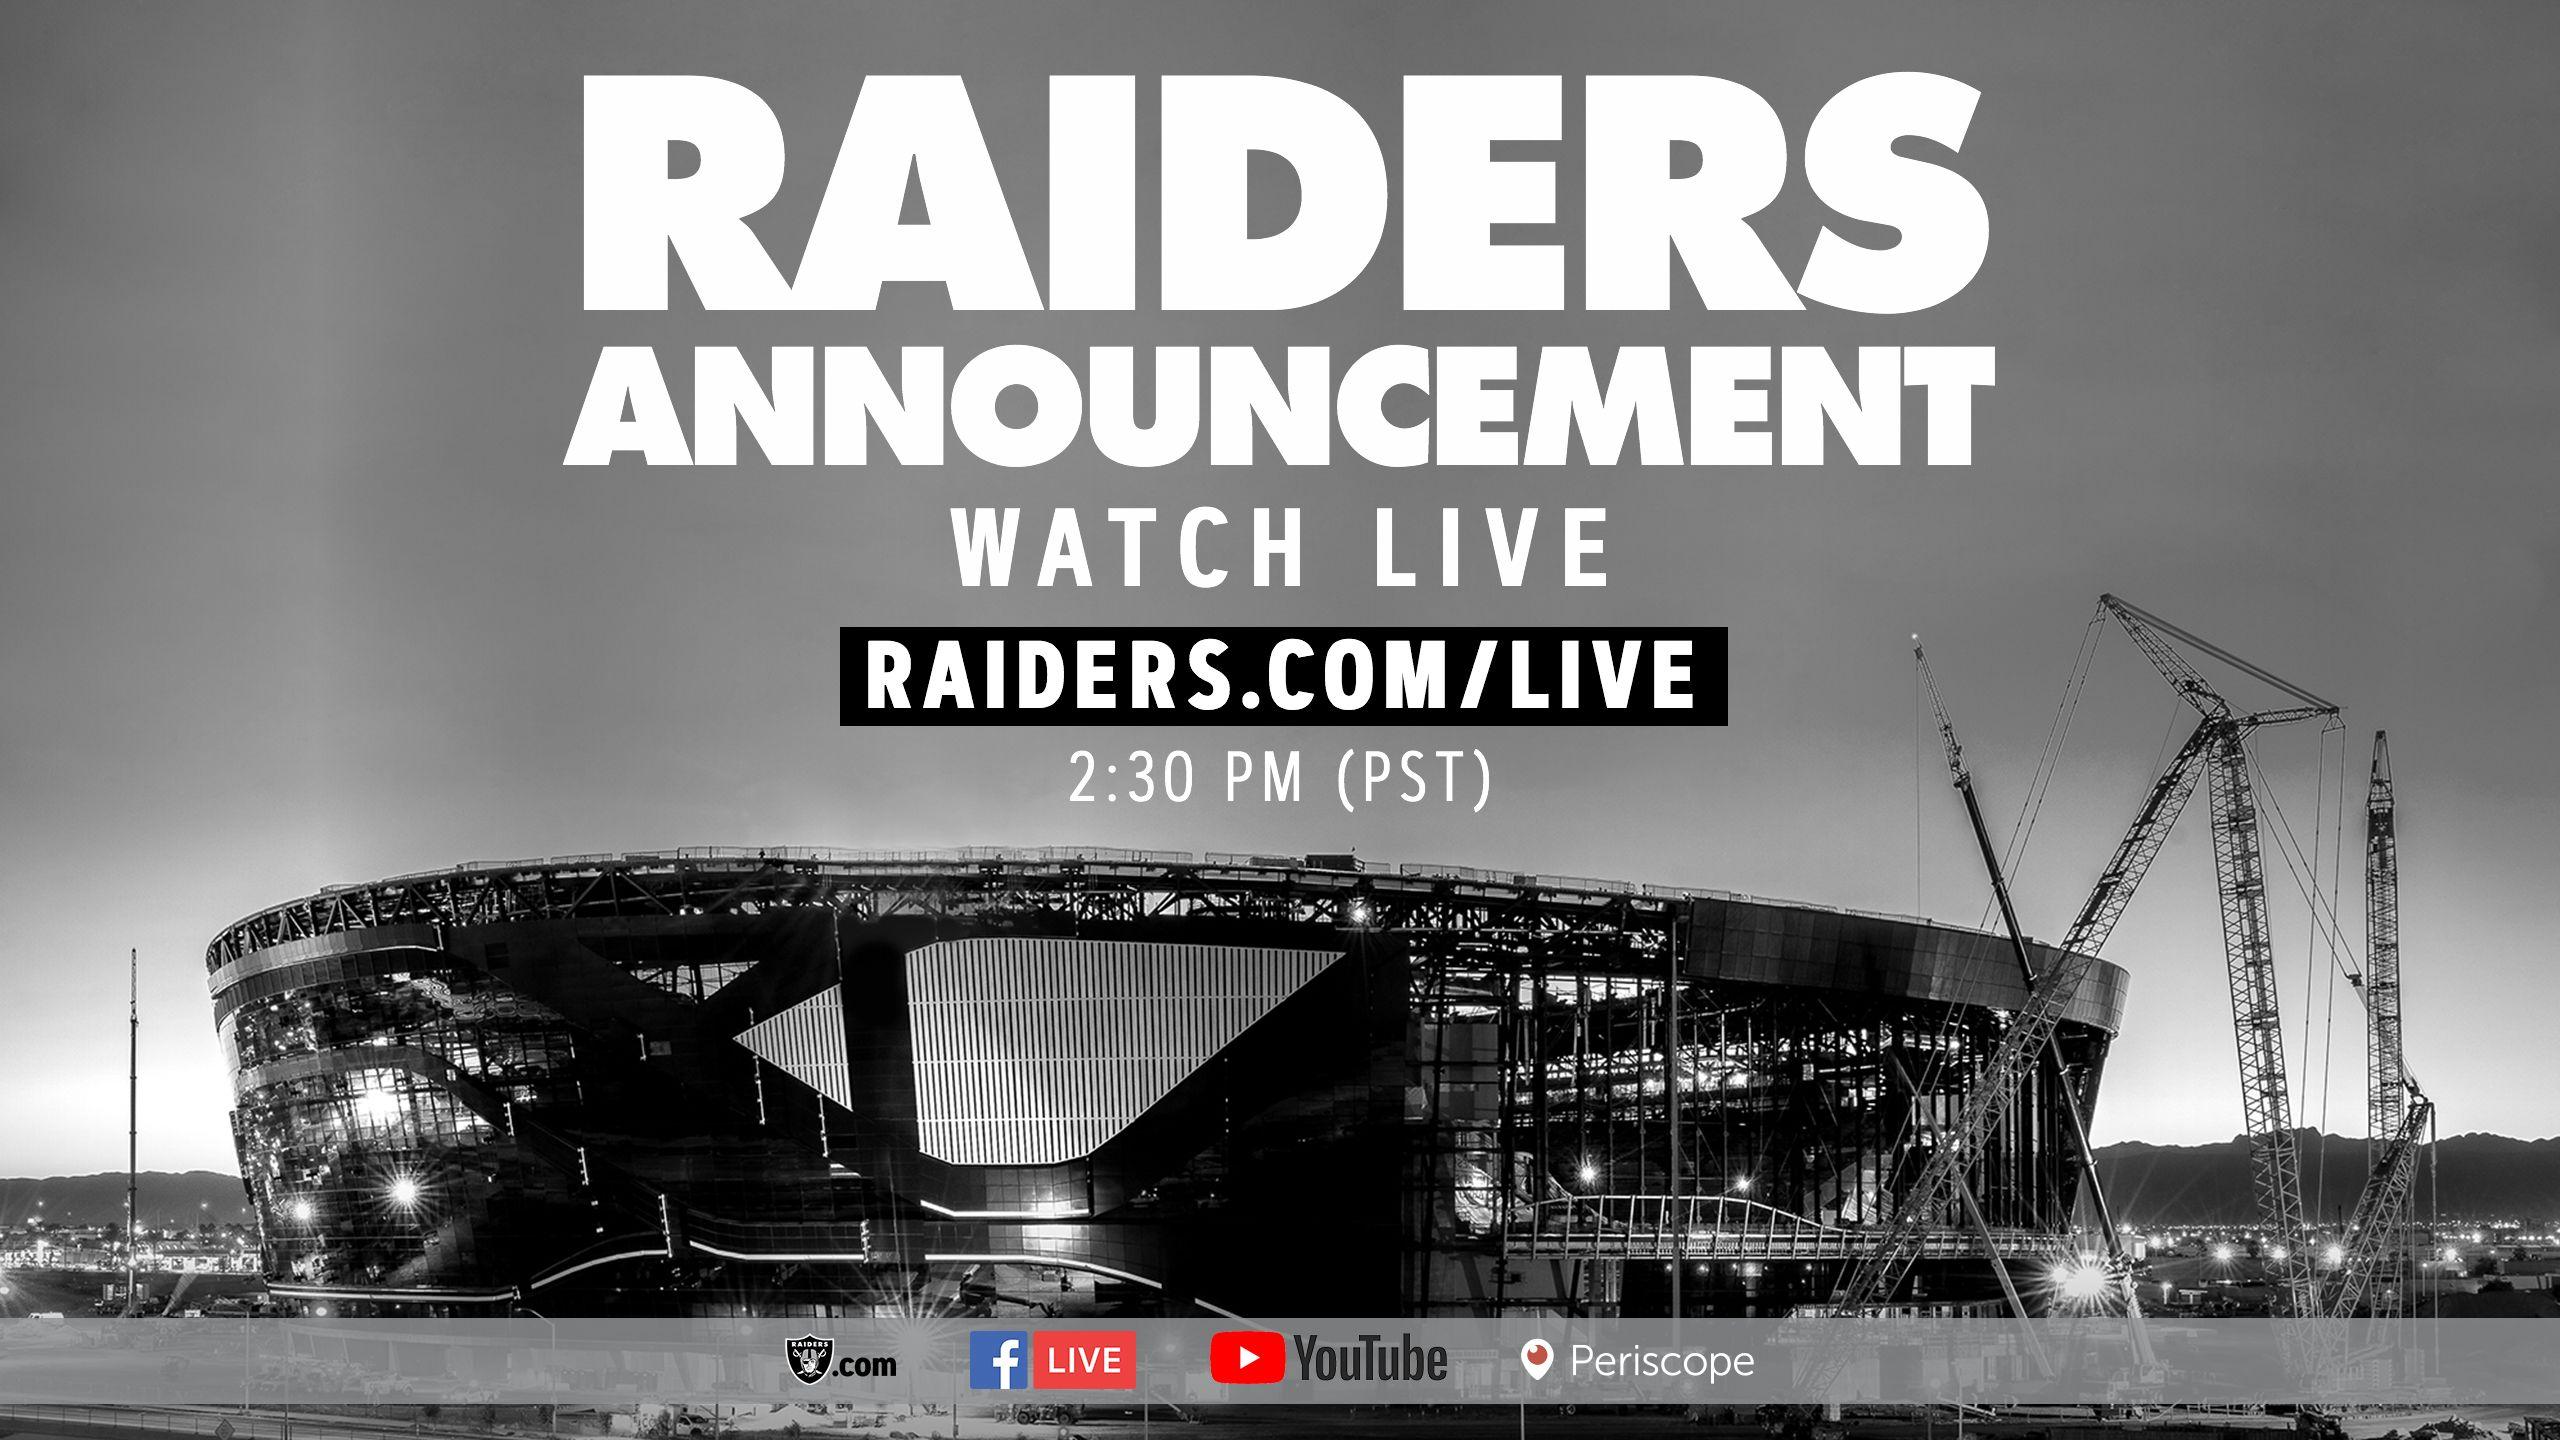 LVRaidersNamingAnnouncement_Live (1)